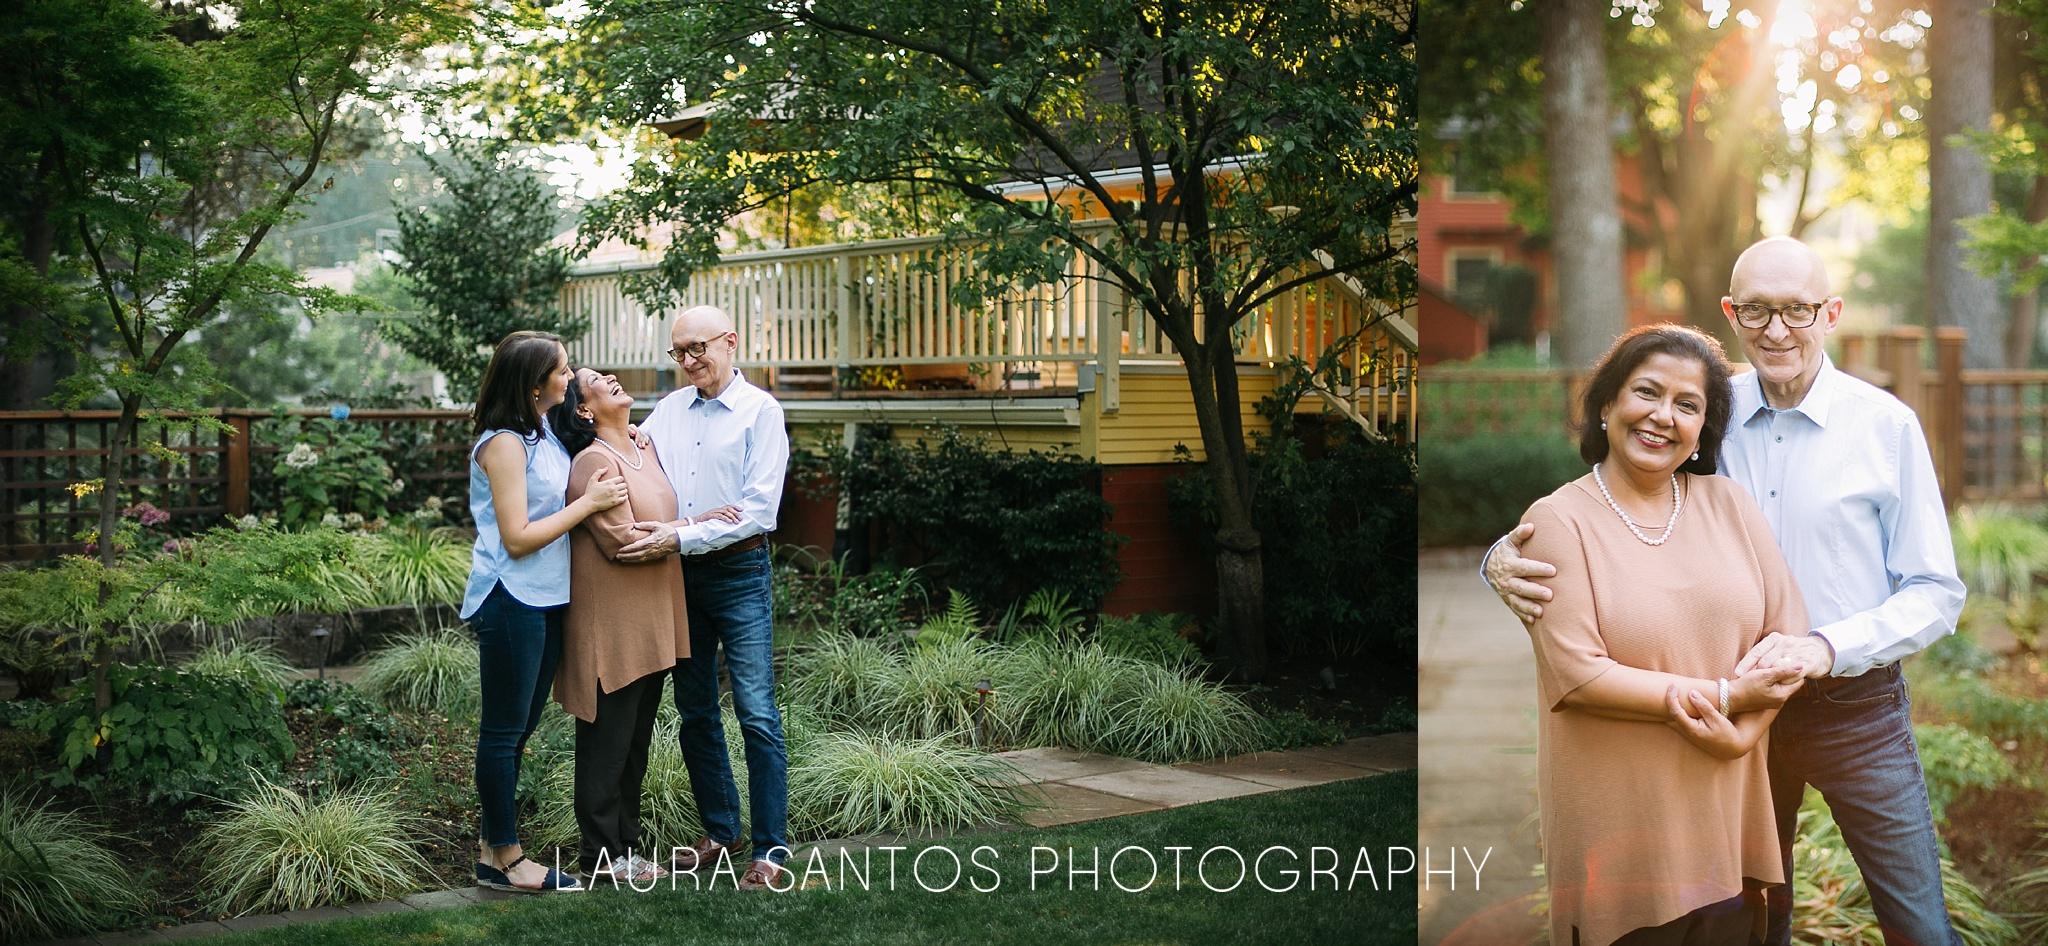 Laura Santos Photography Portland Oregon Family Photographer_0433.jpg